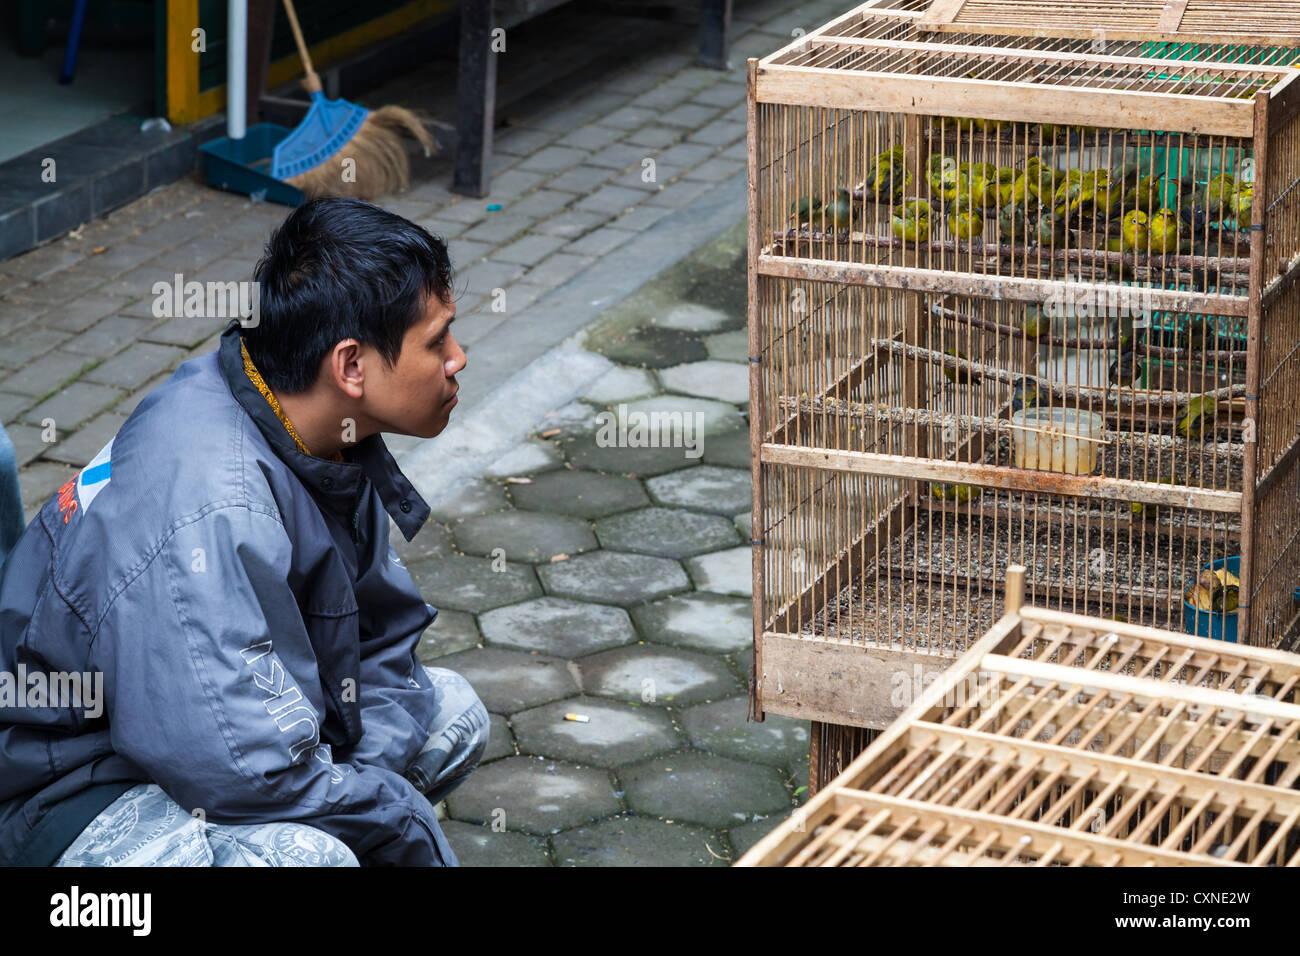 Mann beobachtet Vögel auf den Vogelmarkt in Yogyakarta in Indonesien Stockbild